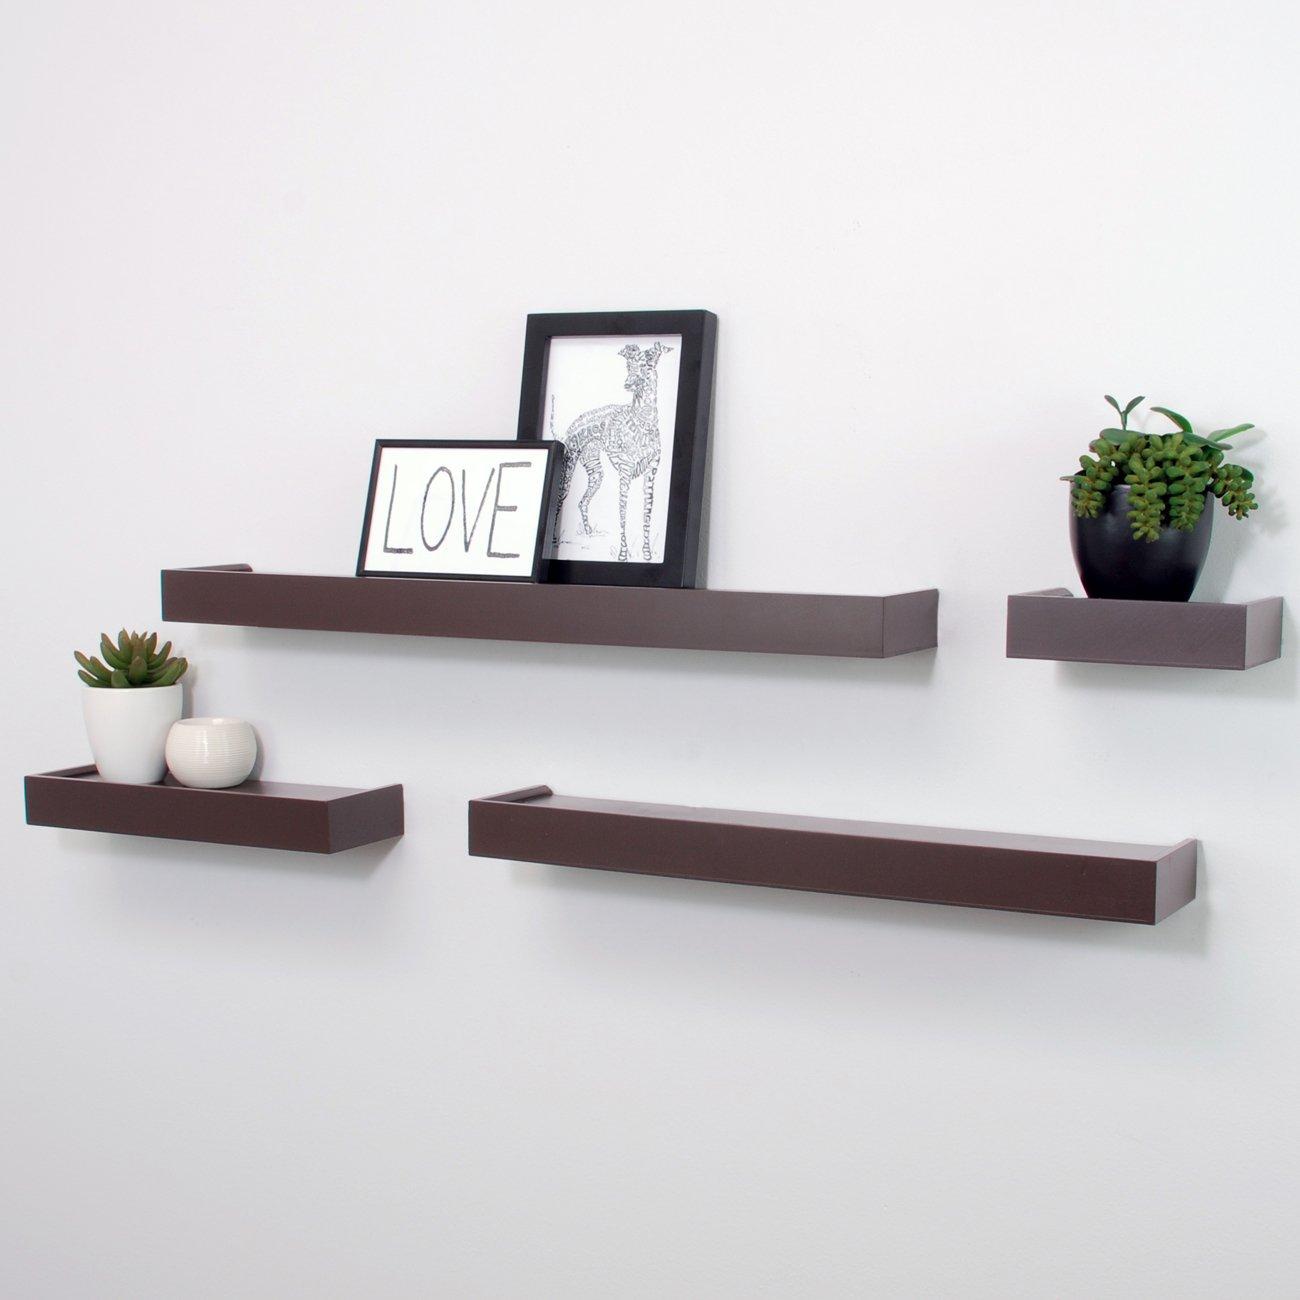 Espresso Floating Display Ledge Shelves Set Of 4 Wall